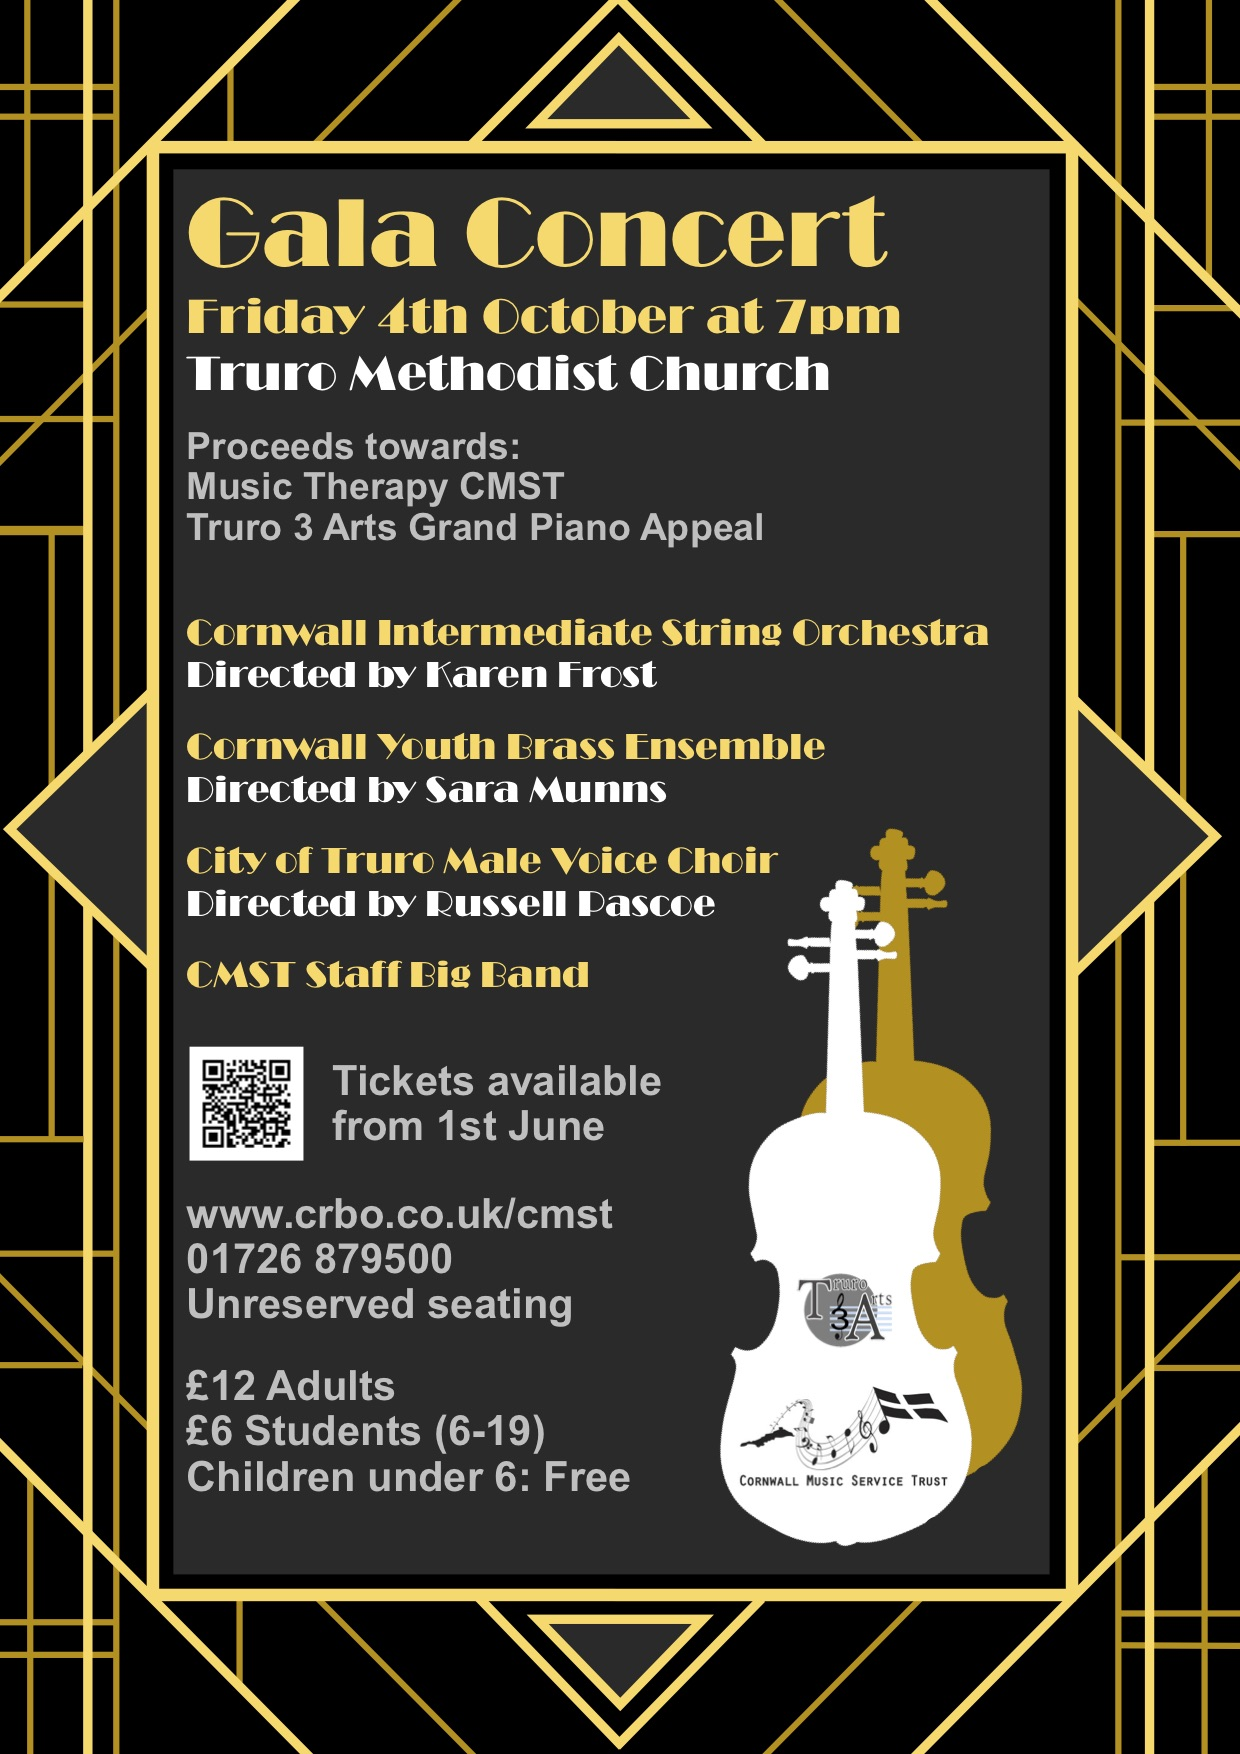 Gala Concert poster FINAL v.2.jpg